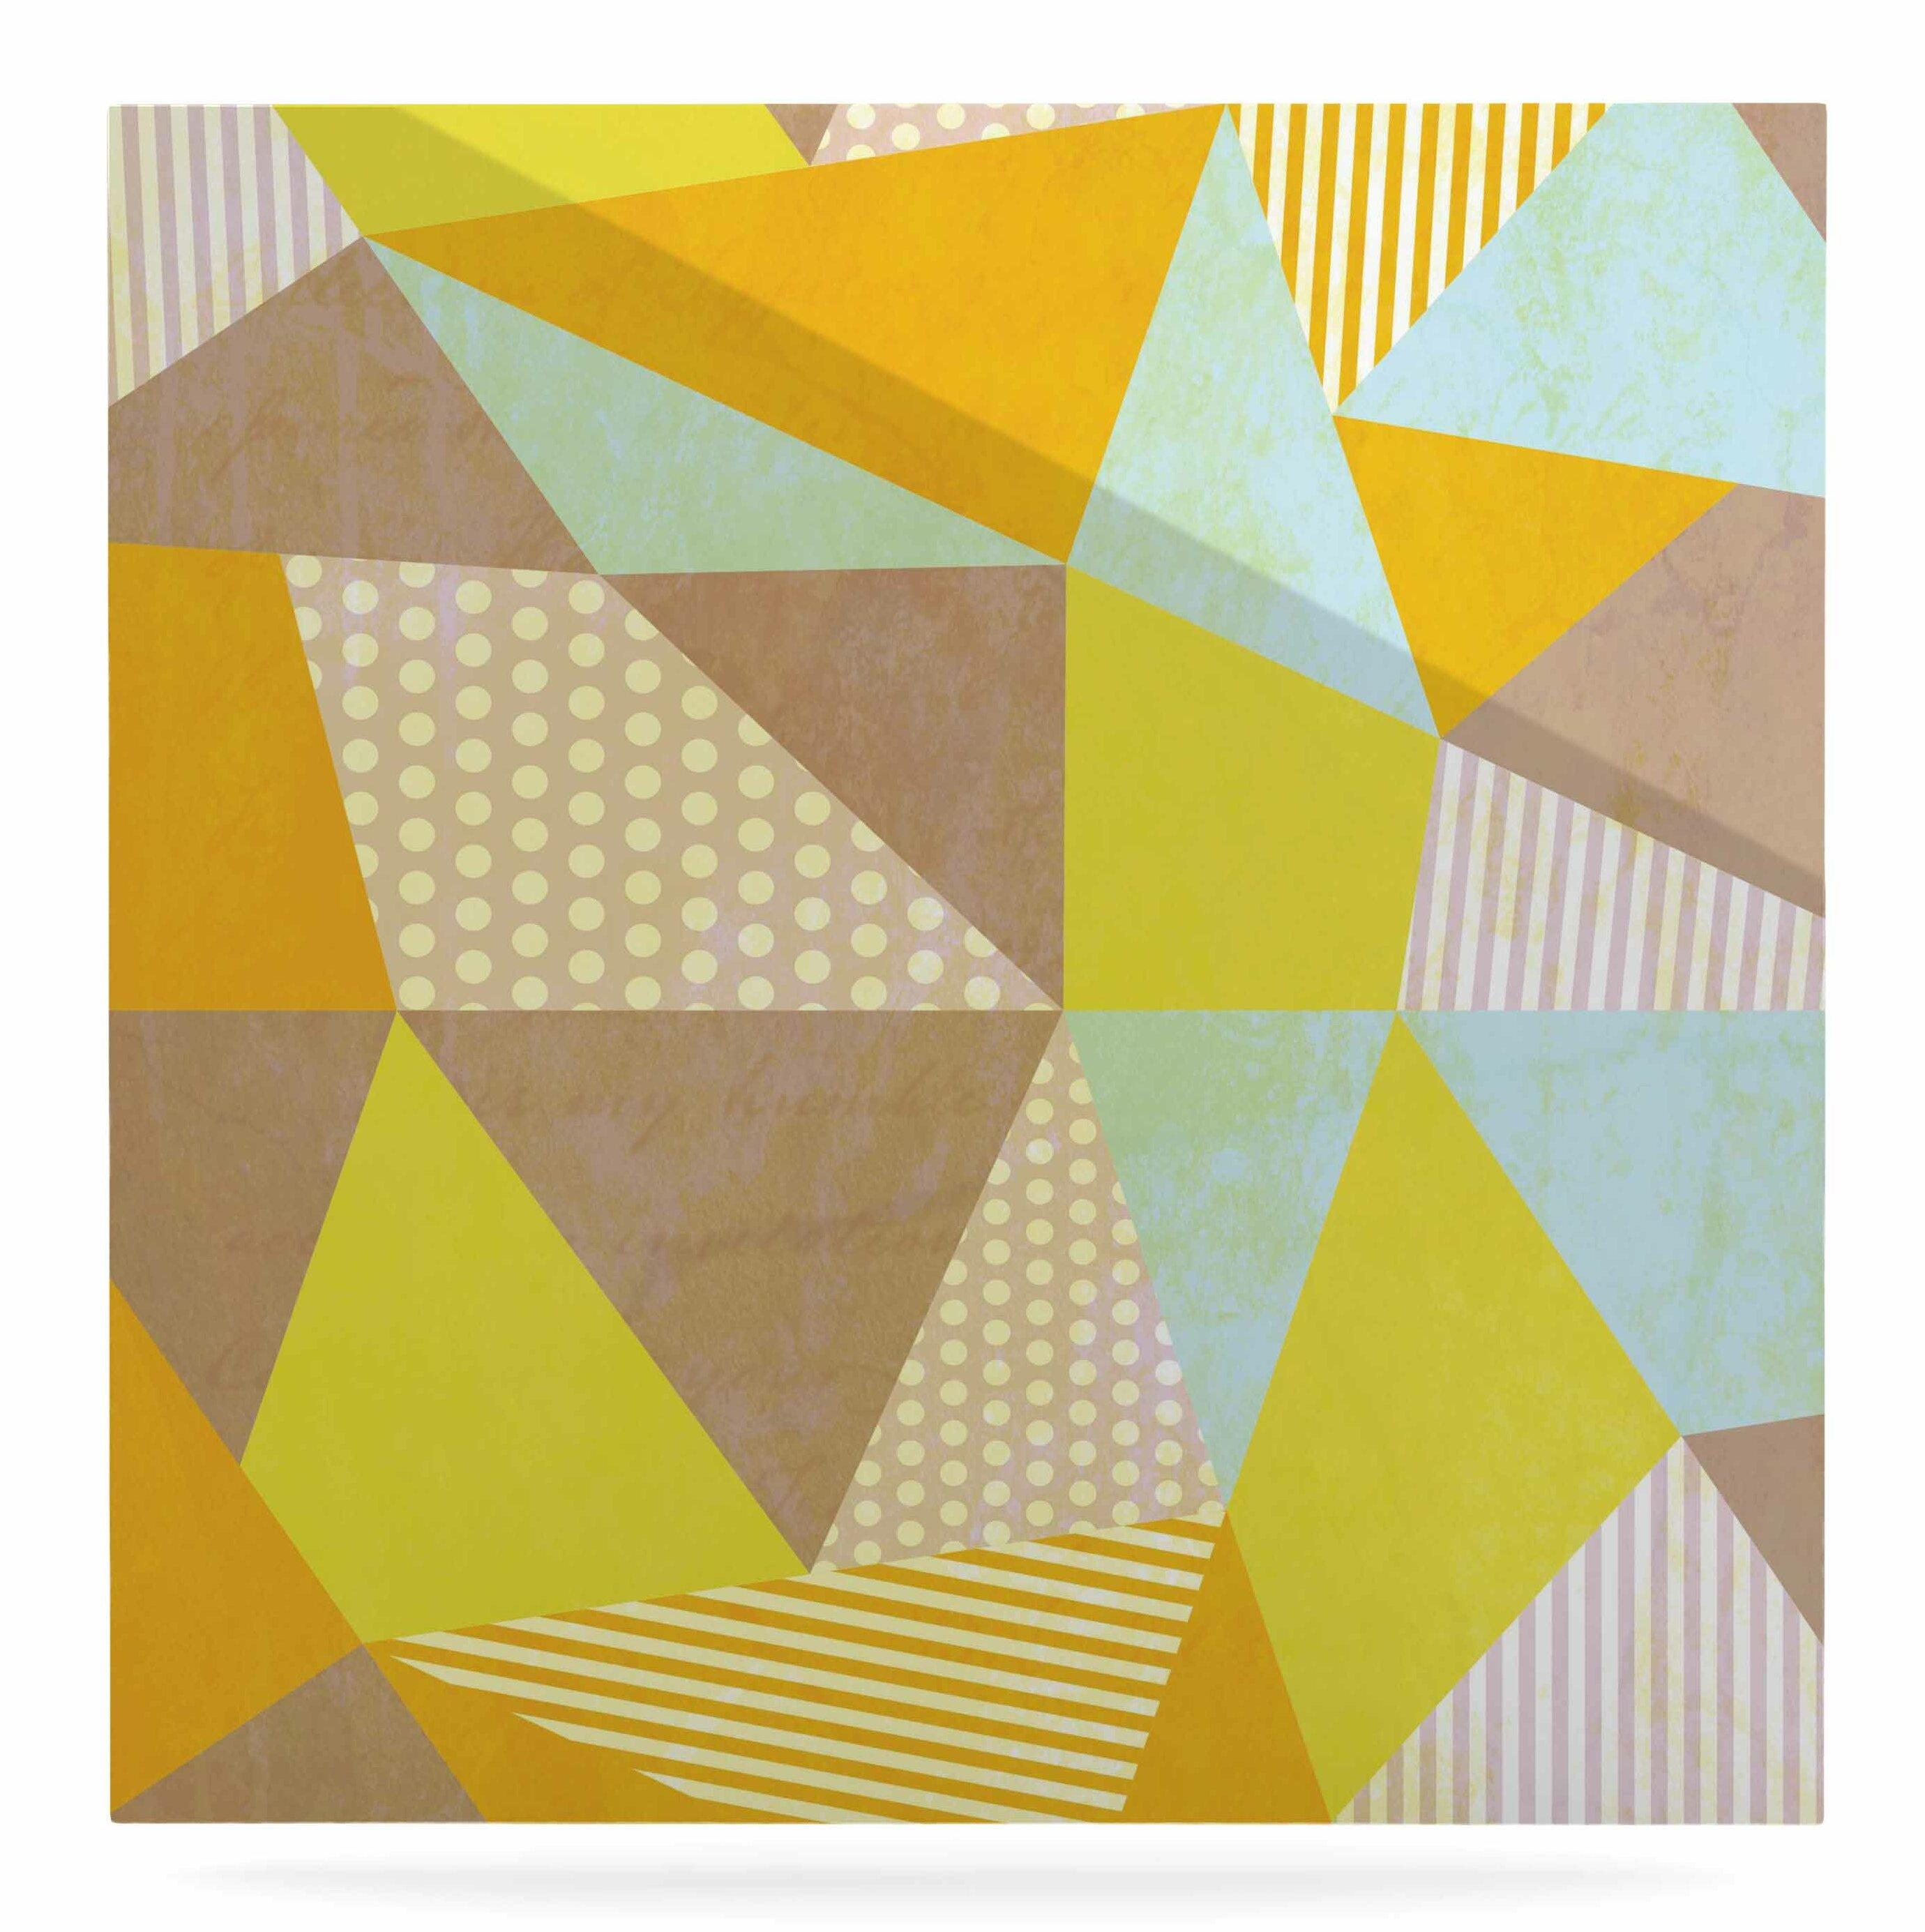 East Urban Home \'Geometric\' Graphic Art Print on Metal | Wayfair